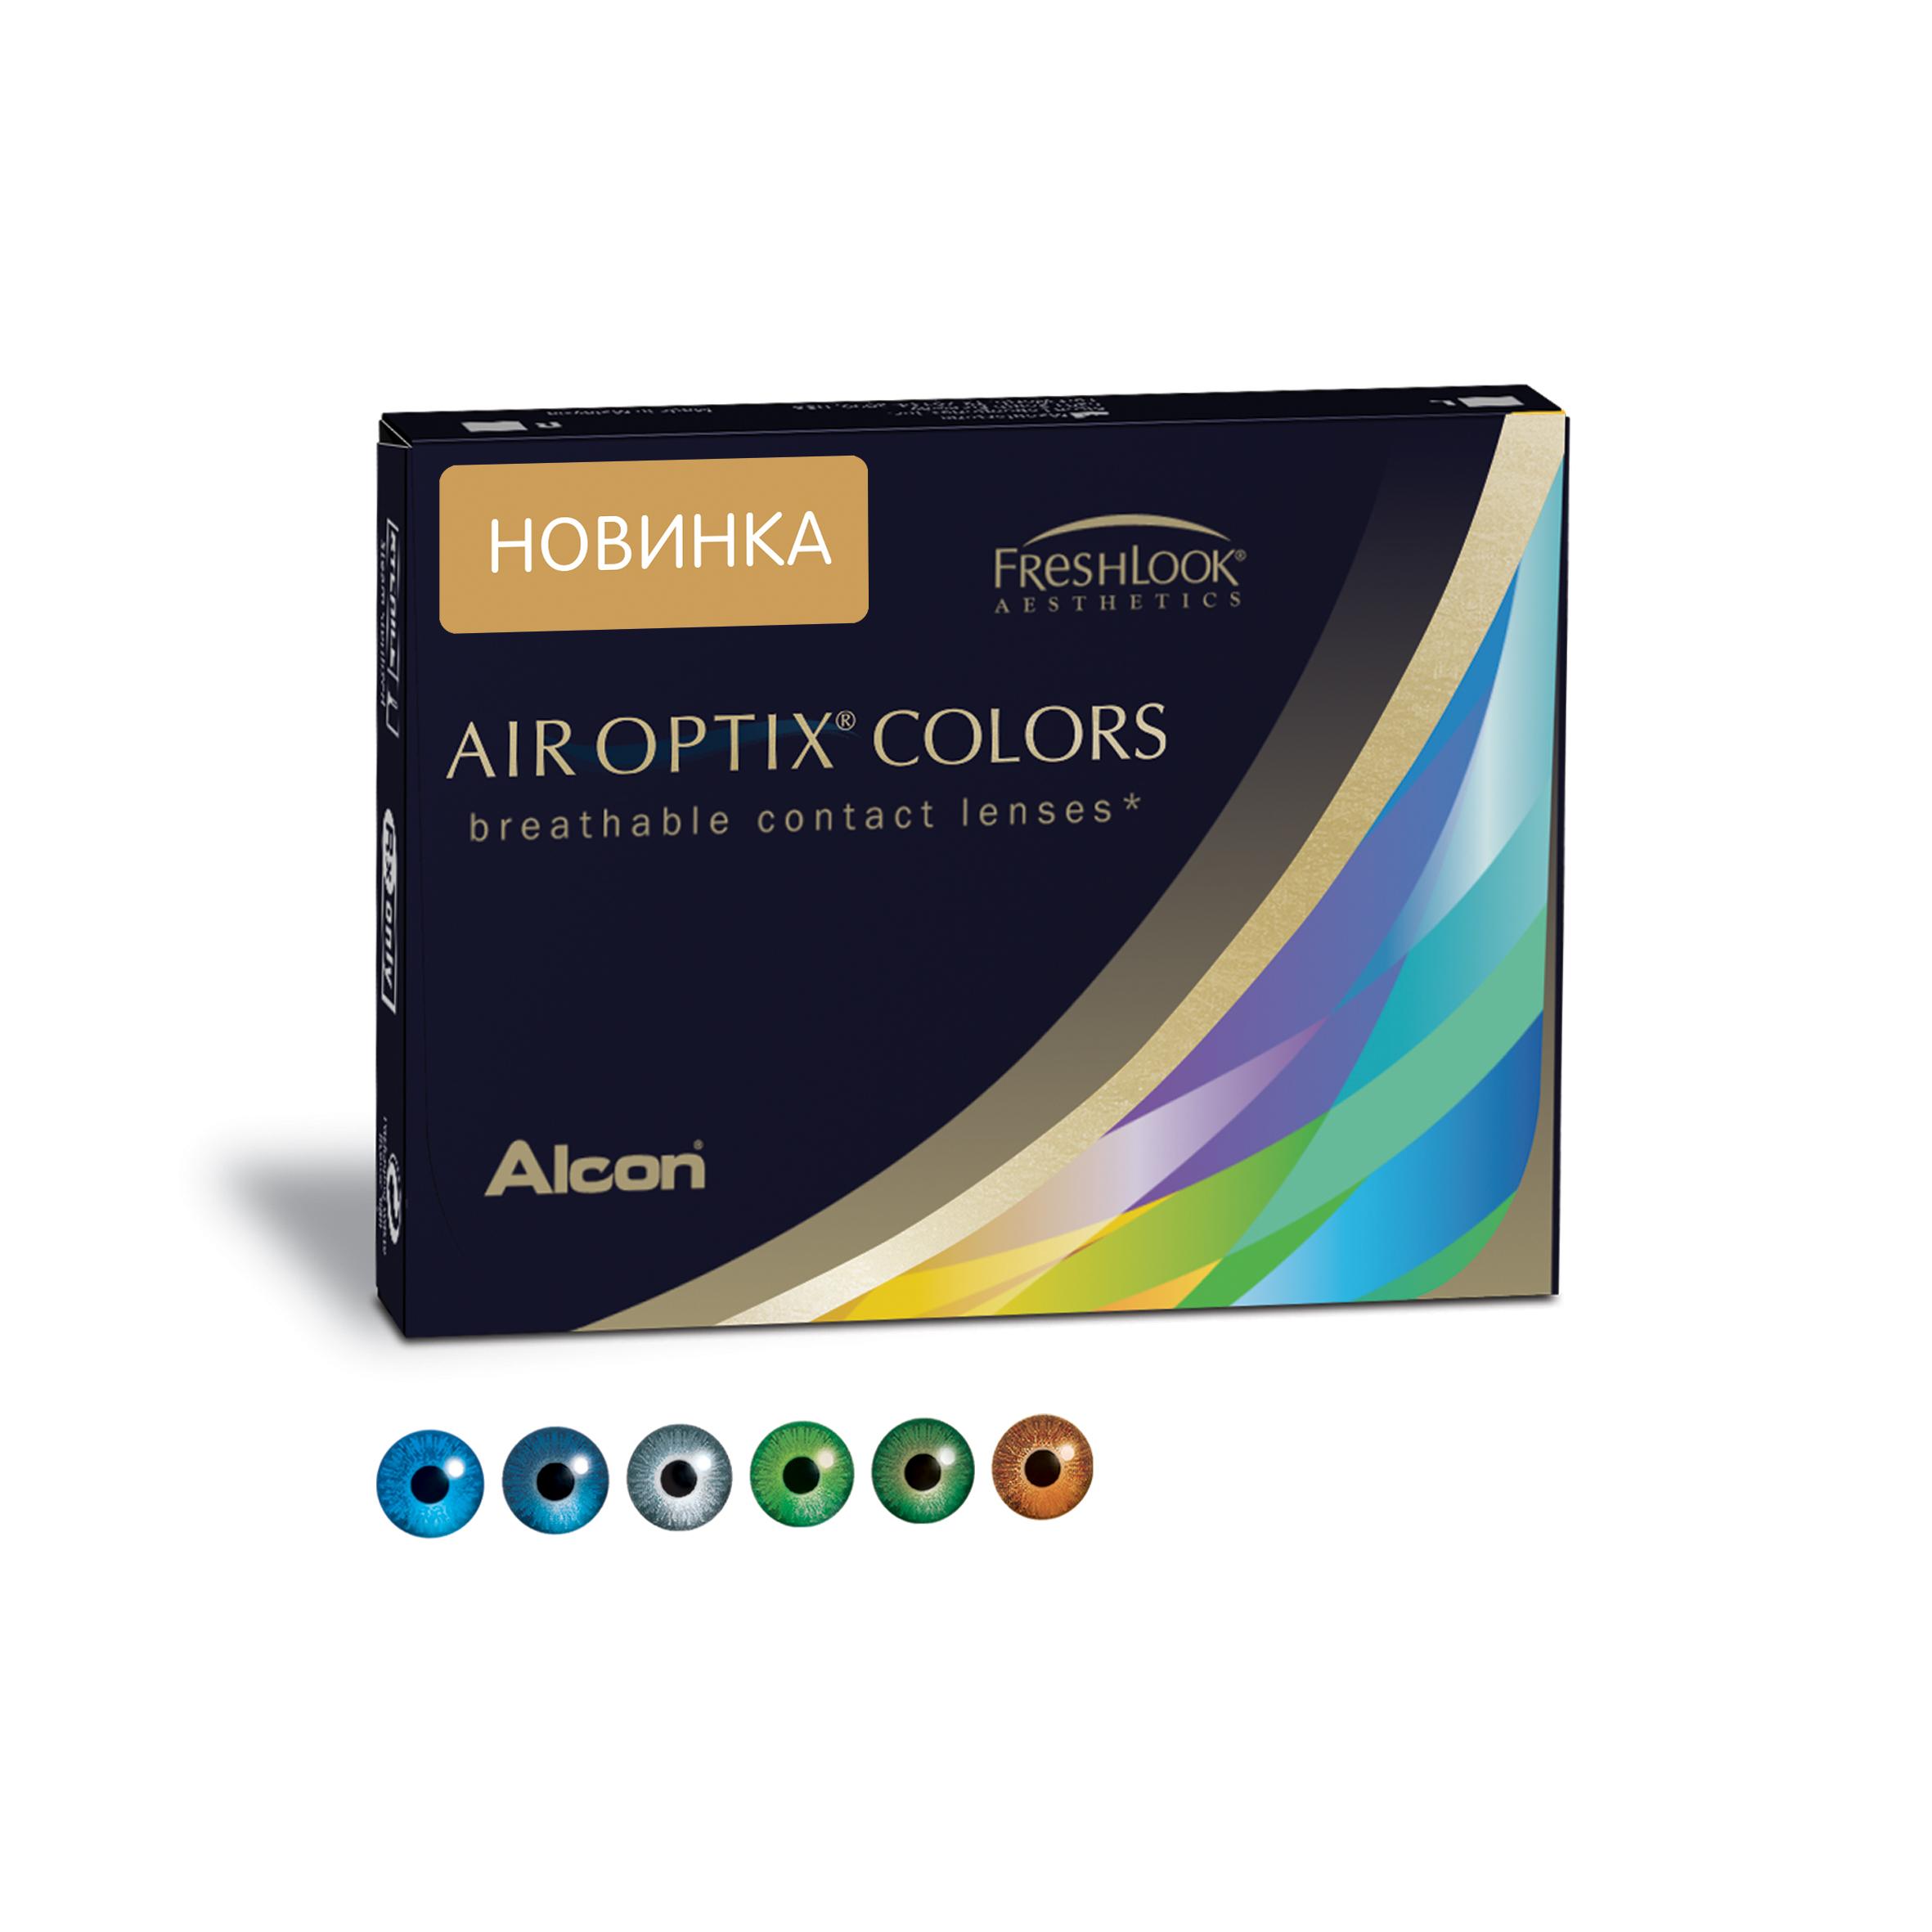 Аlcon контактные линзы Air Optix Colors 2 шт -3.00 Honey